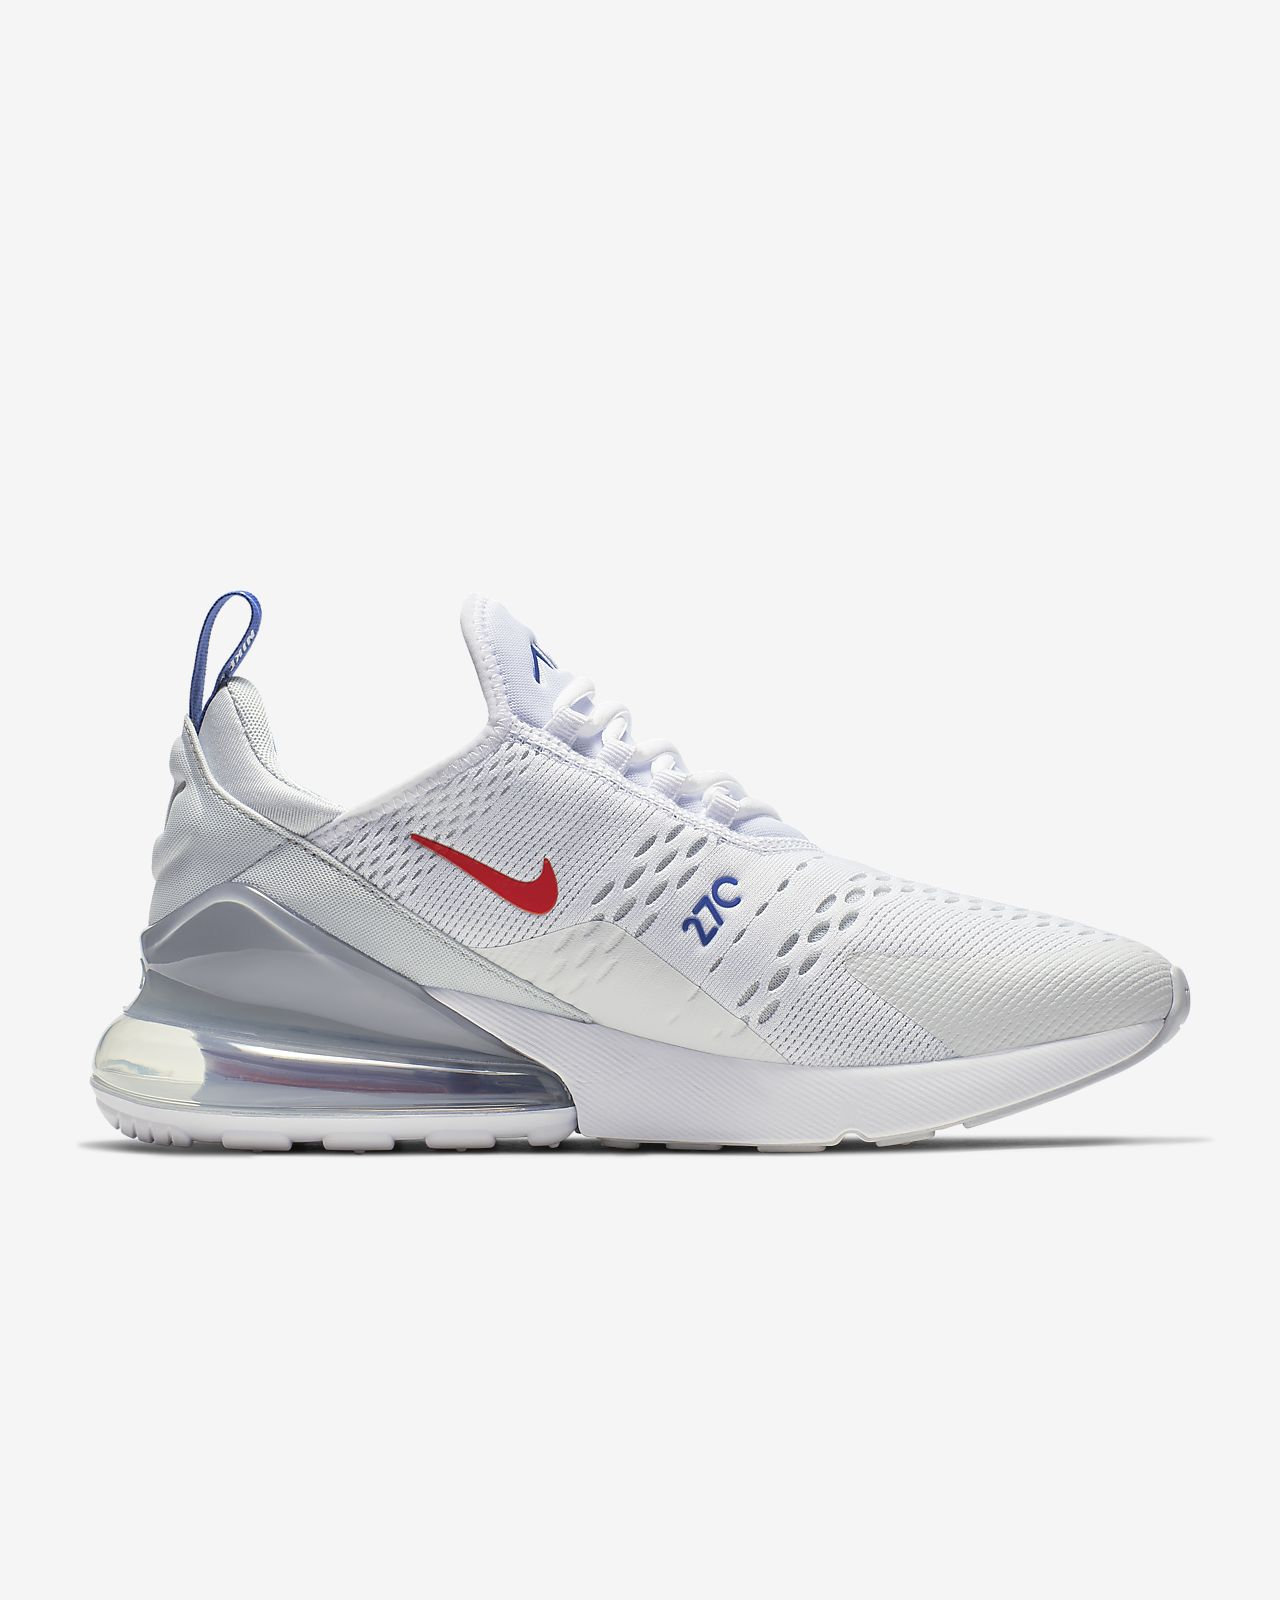 lowest price e75bb 39eb2 ... Nike Air Max 270 Men s Shoe